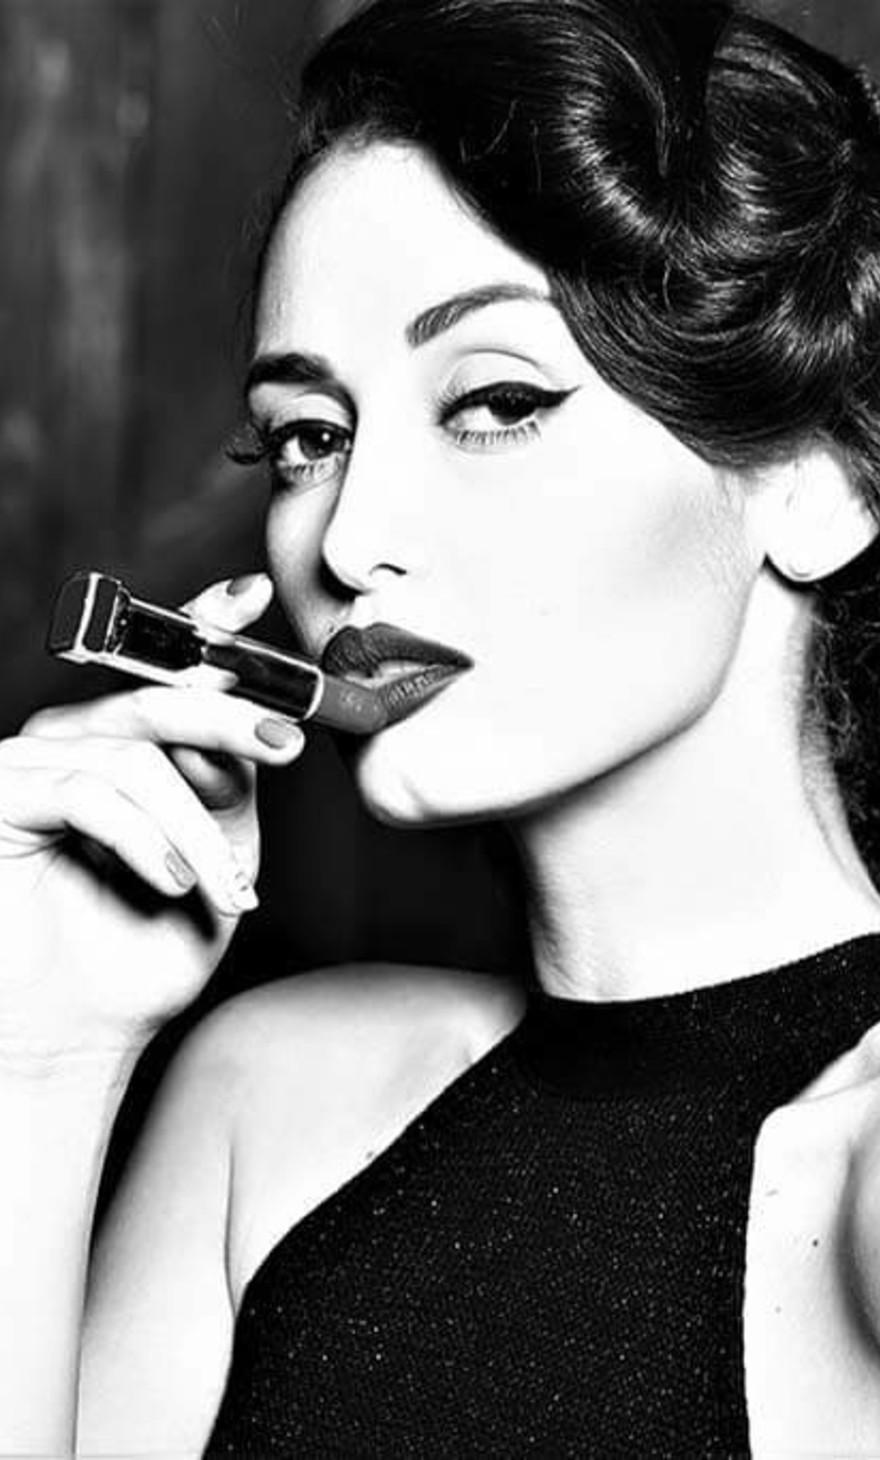 Lipstick woman